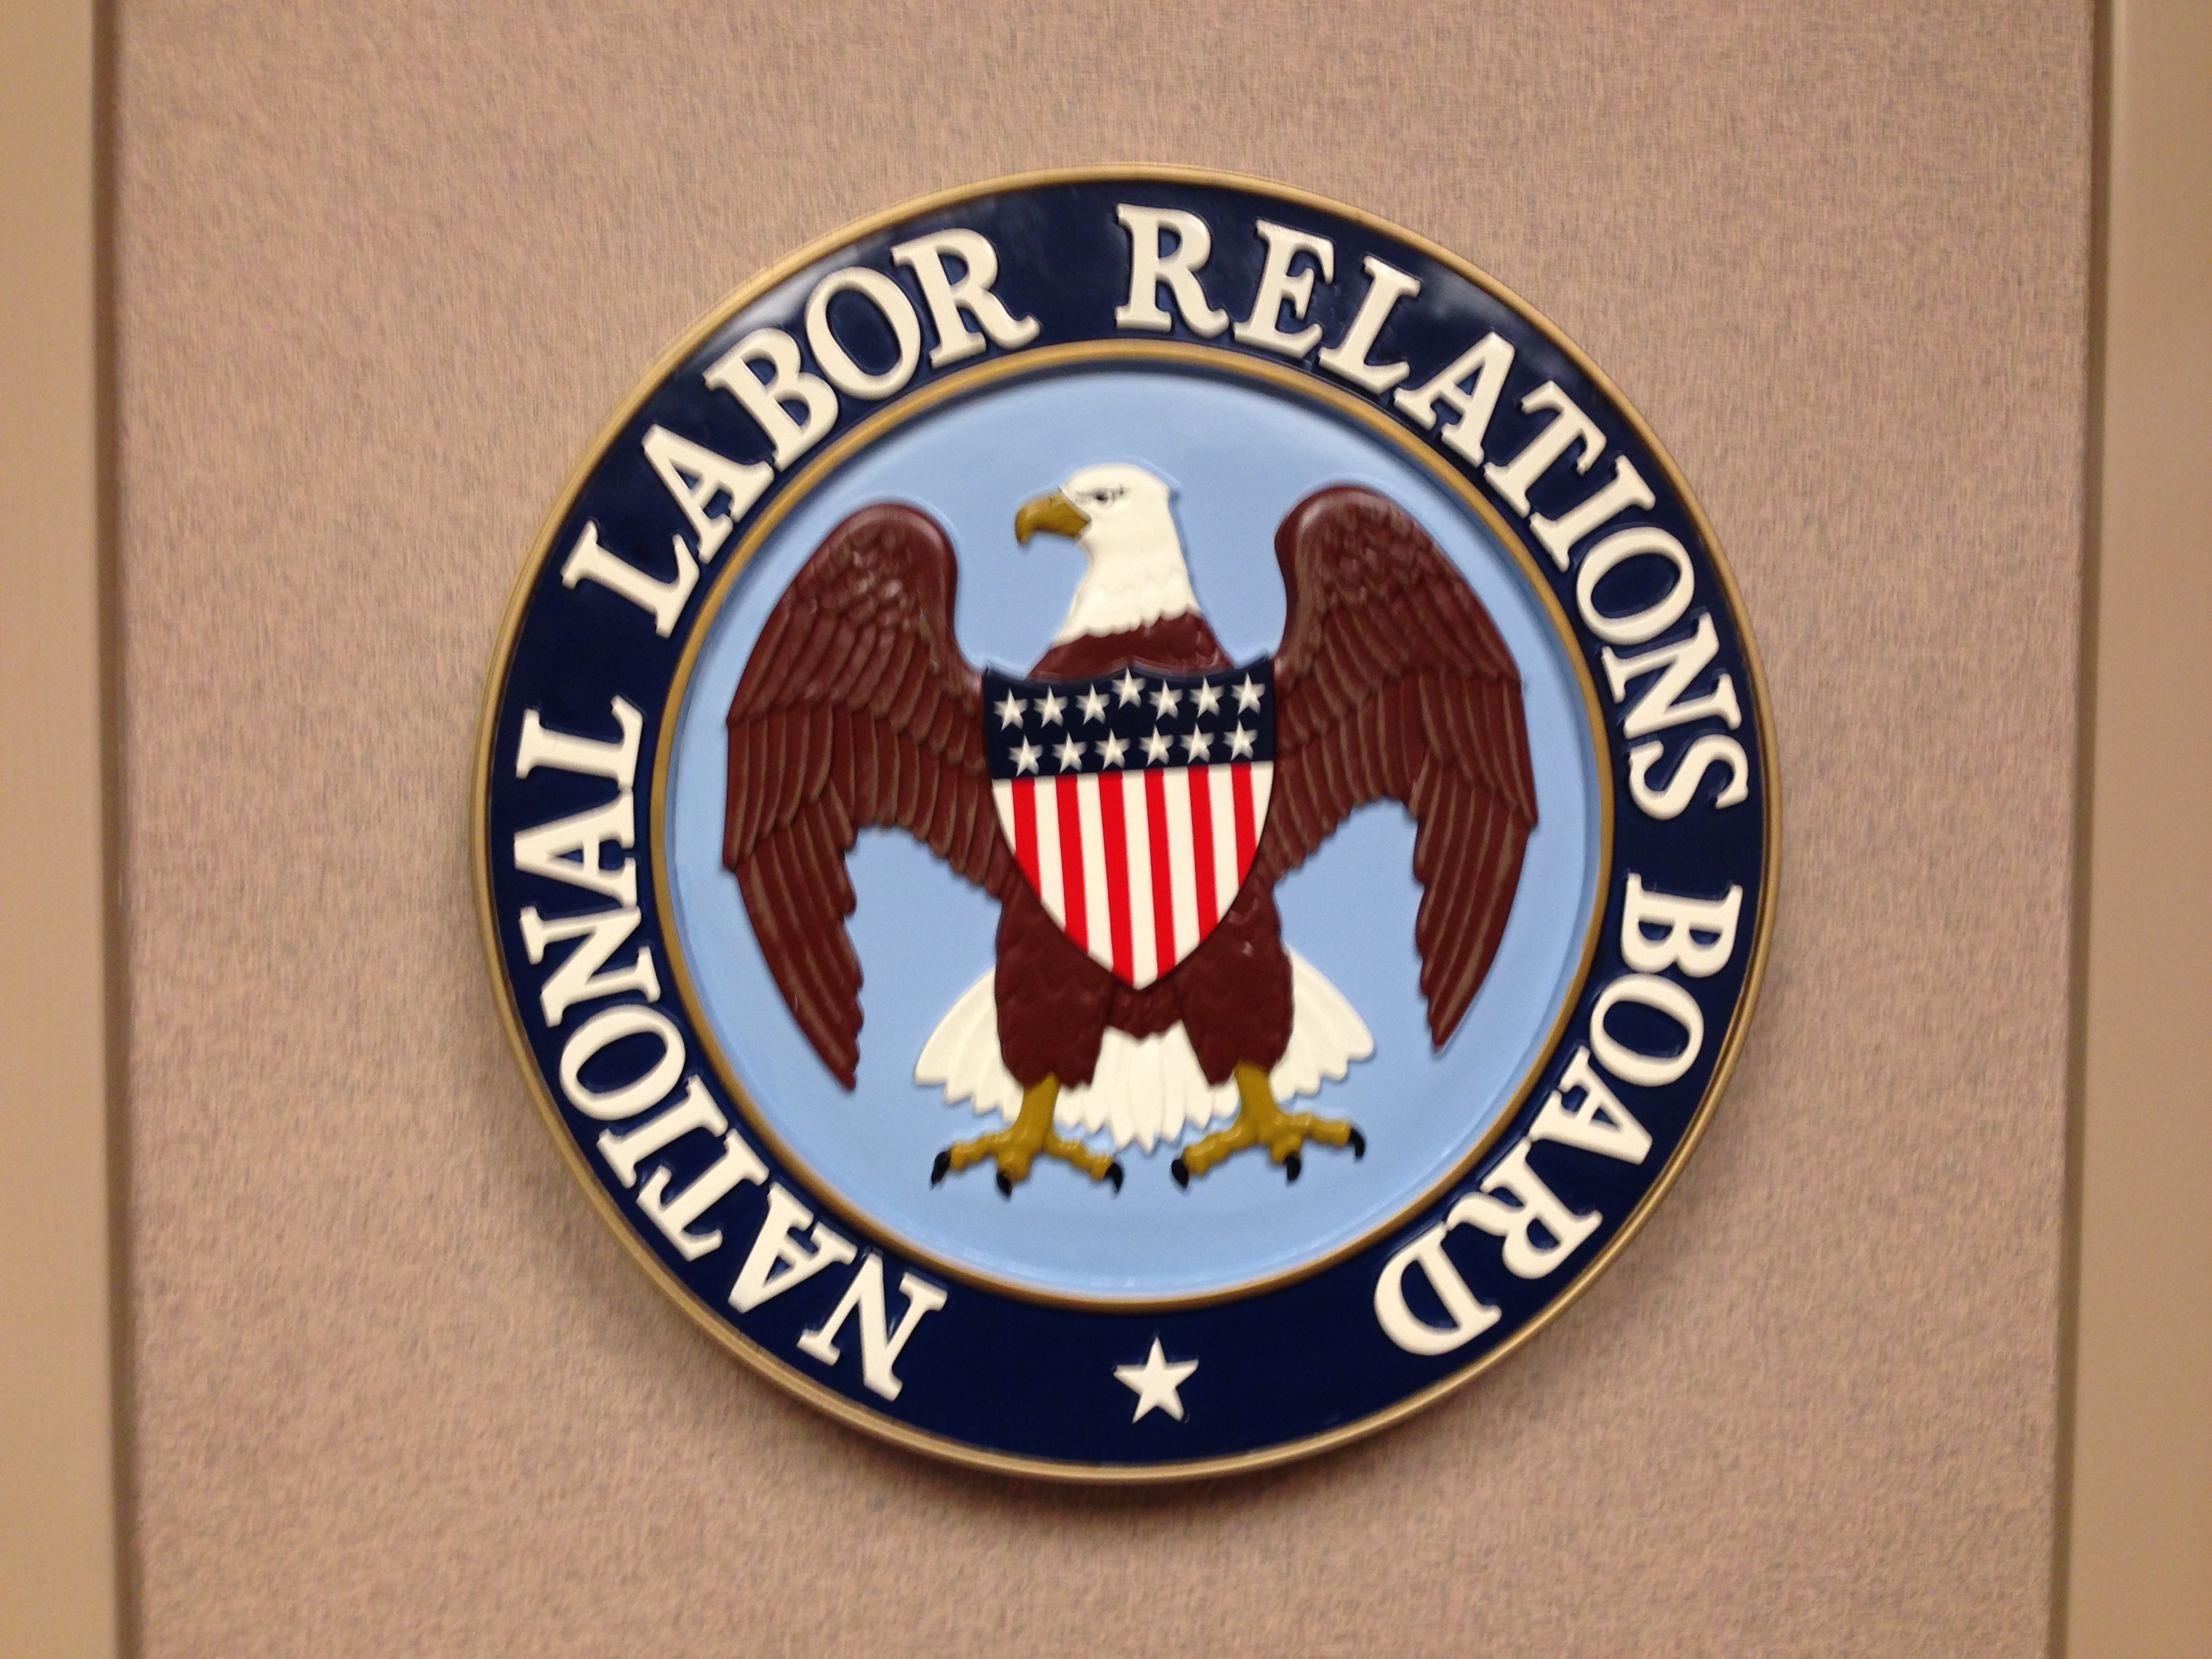 Mercedes benz faces federal labor complaints alabama for Mercedes benz complaint department